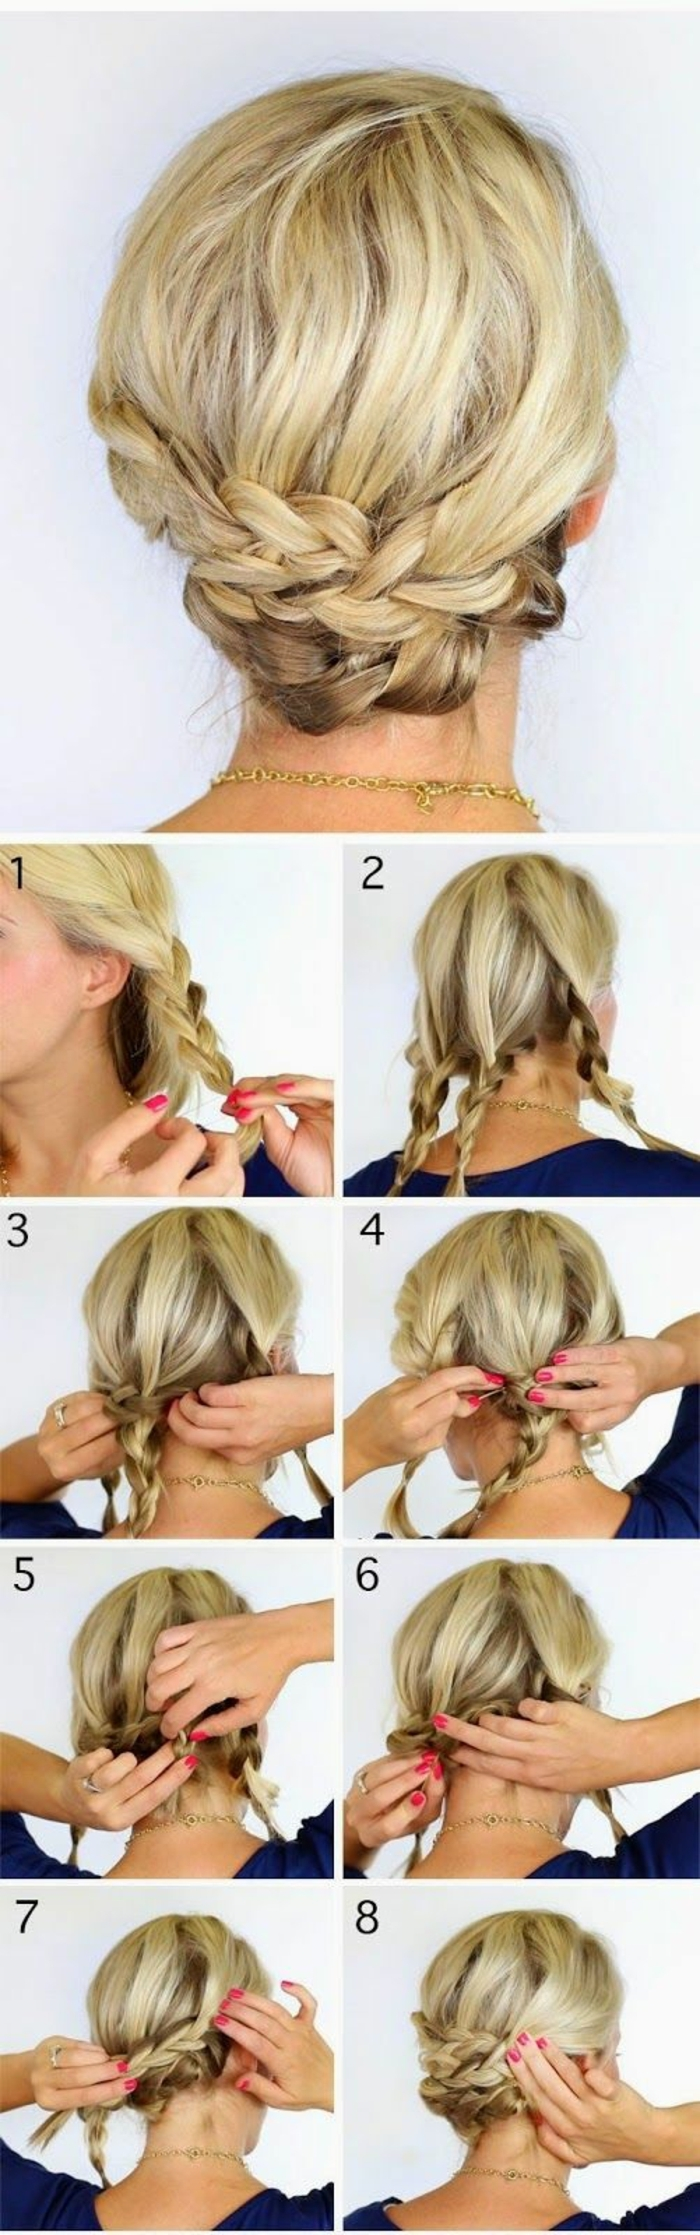 chignon-facile-a-faire-chignon-avec-tresses-cheveux-blonds